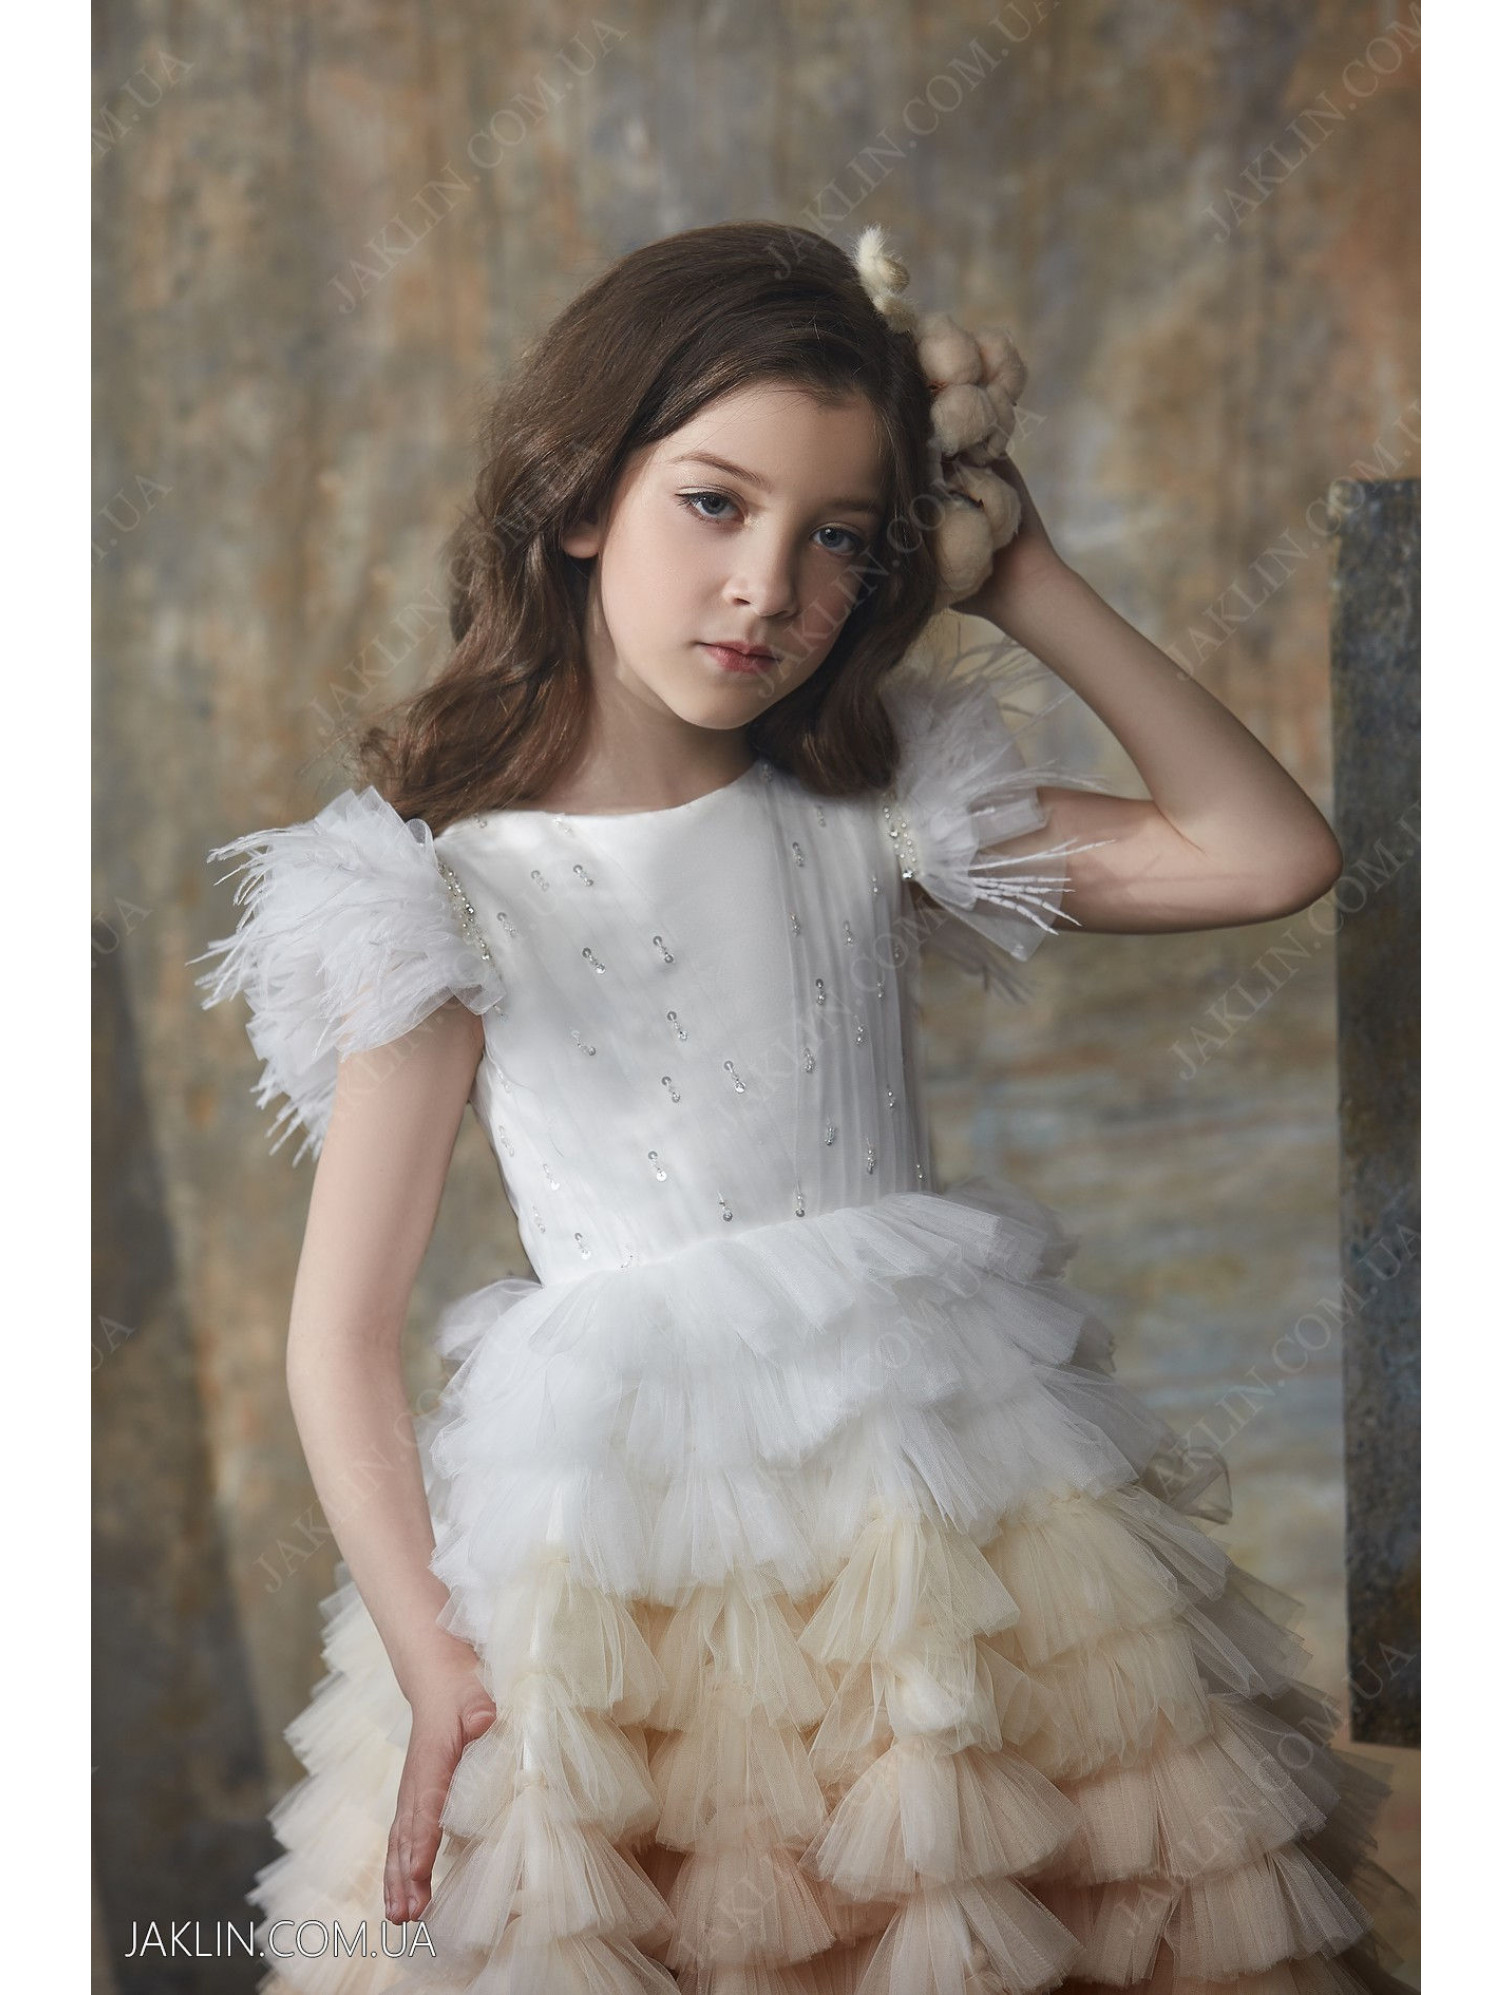 Child dress 3026